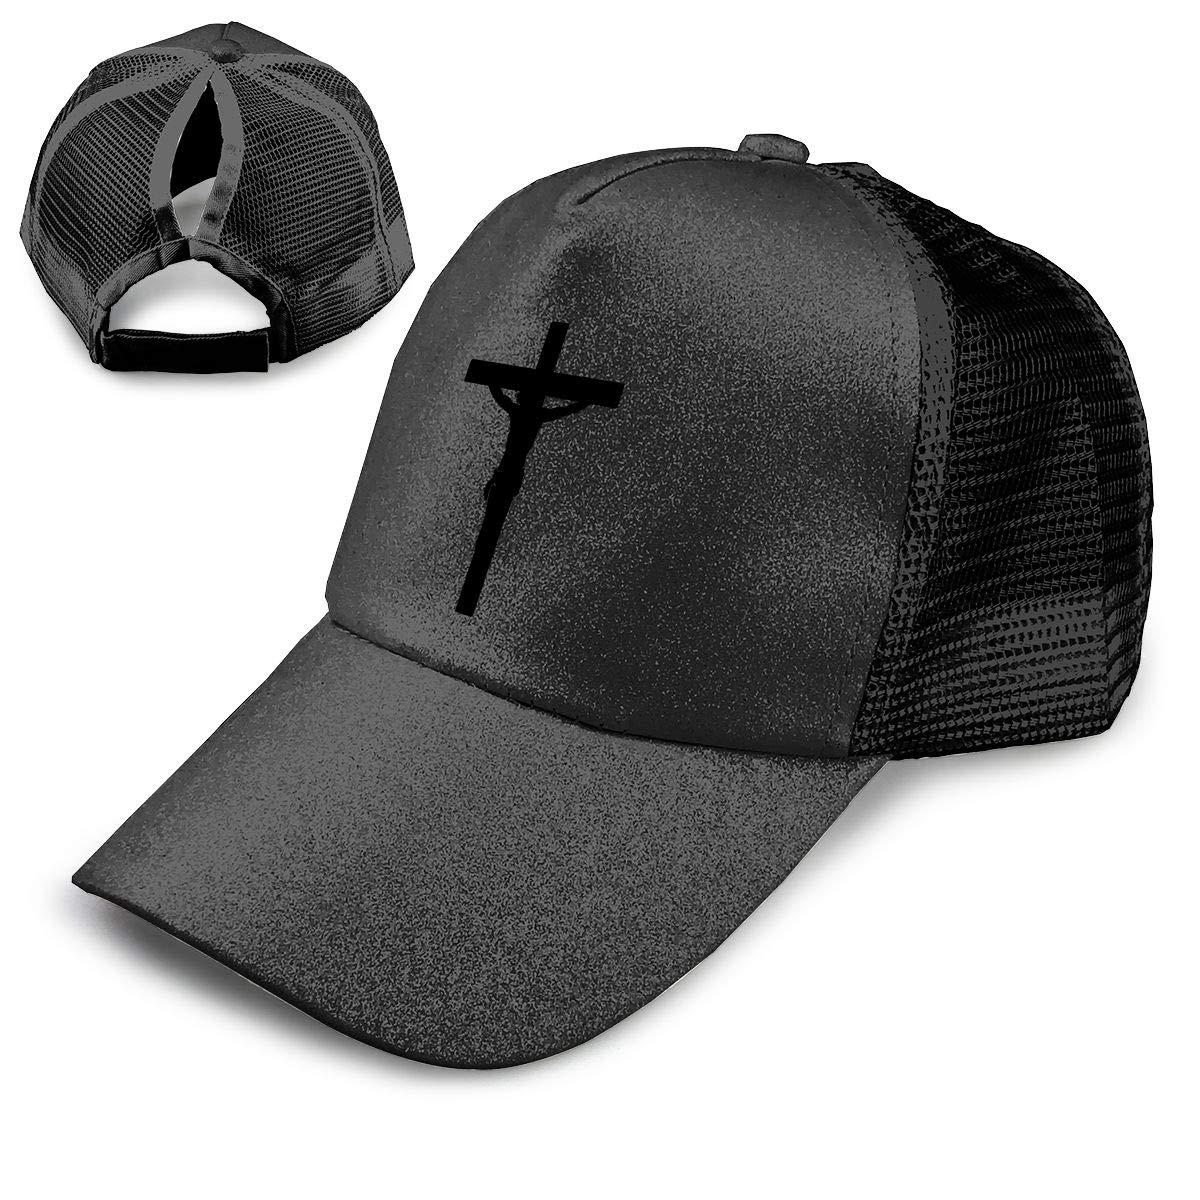 Crucifixion Ponytail Messy High Bun Hat Ponycaps Baseball Cap Adjustable Trucker Cap Mesh Cap